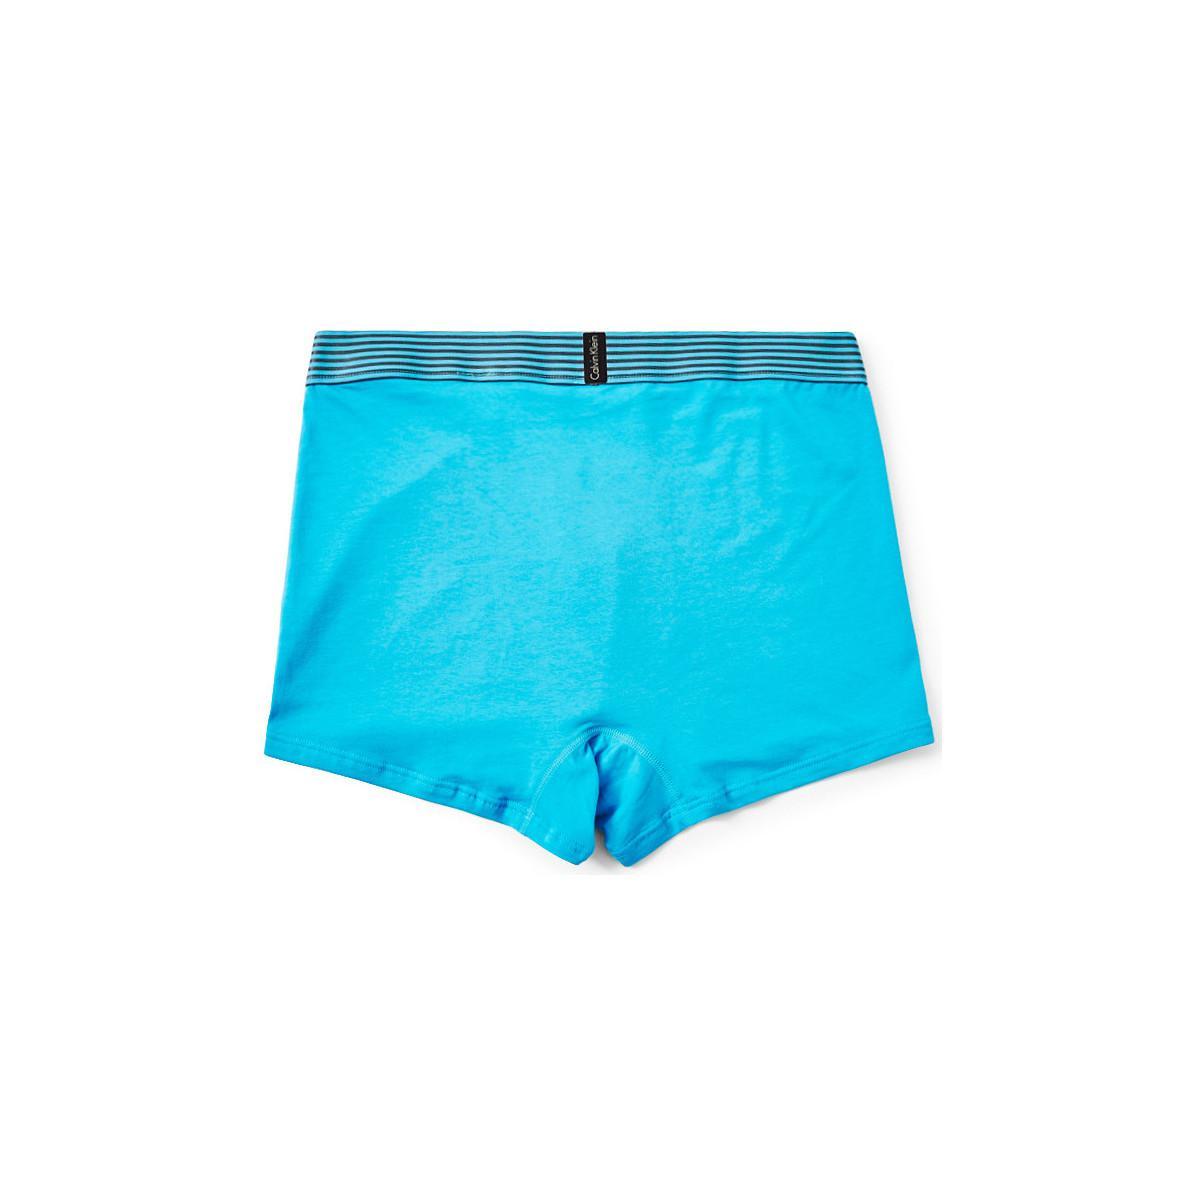 calvin klein jeans iron strength cotton trunk light blue. Black Bedroom Furniture Sets. Home Design Ideas